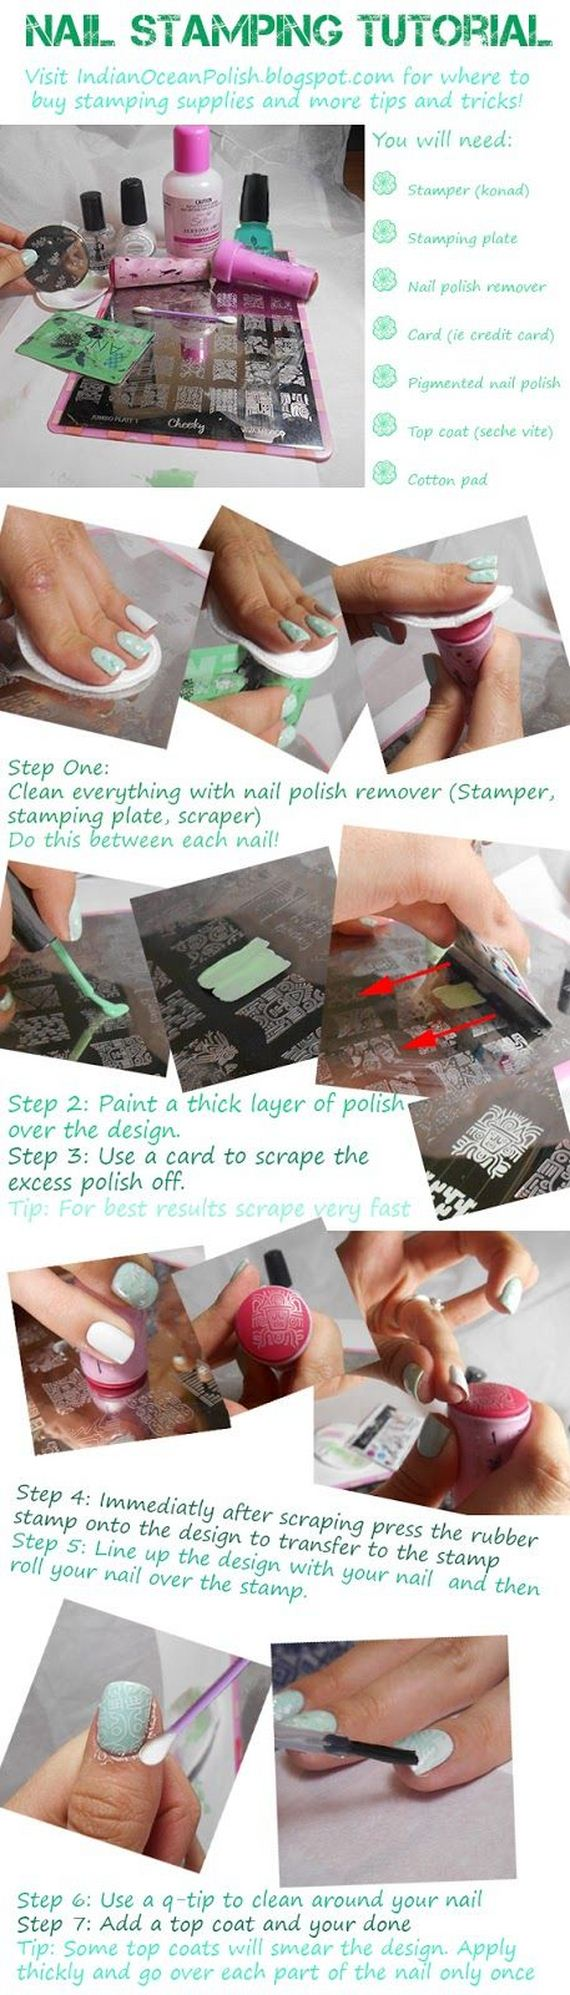 08-make-stamping-nails